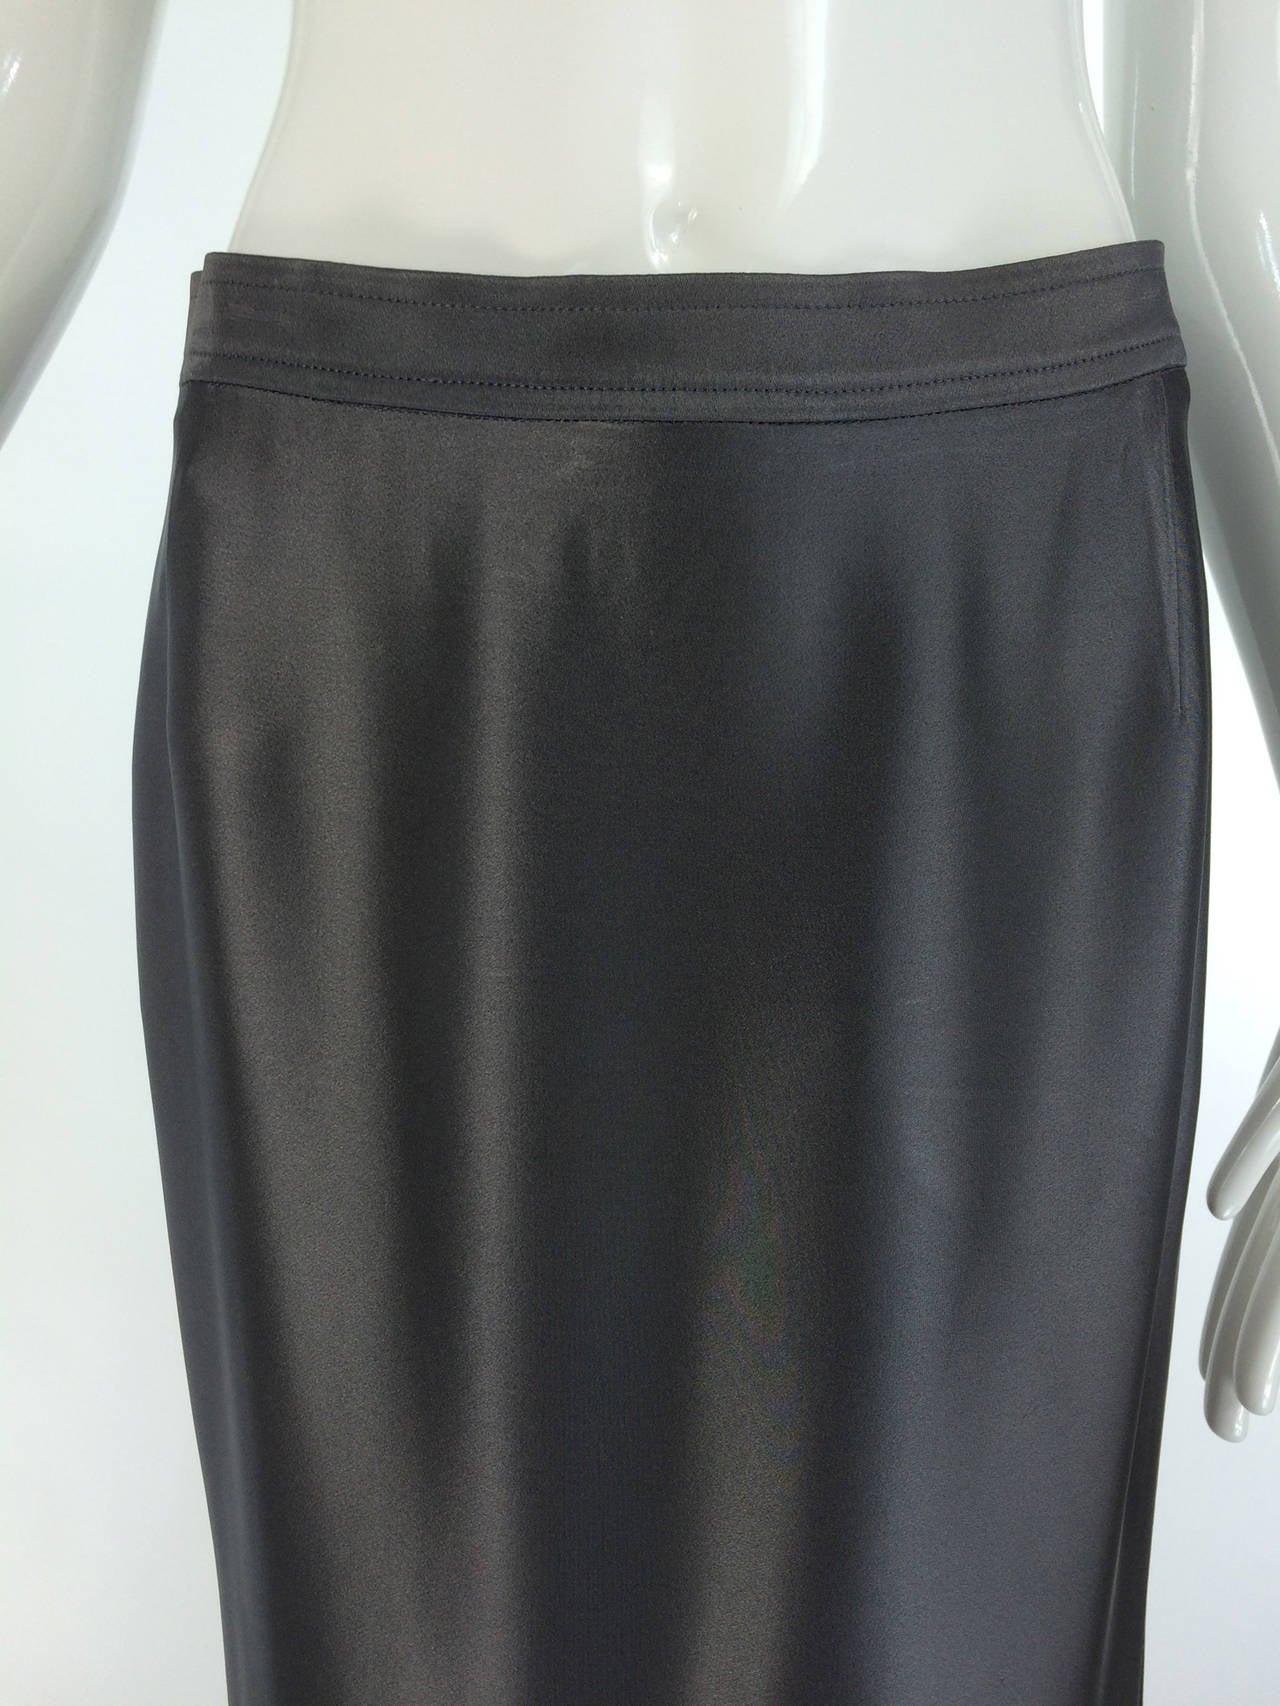 Yves St Laurent Rive Gauche silver grey satin evening skirt 1990s 2